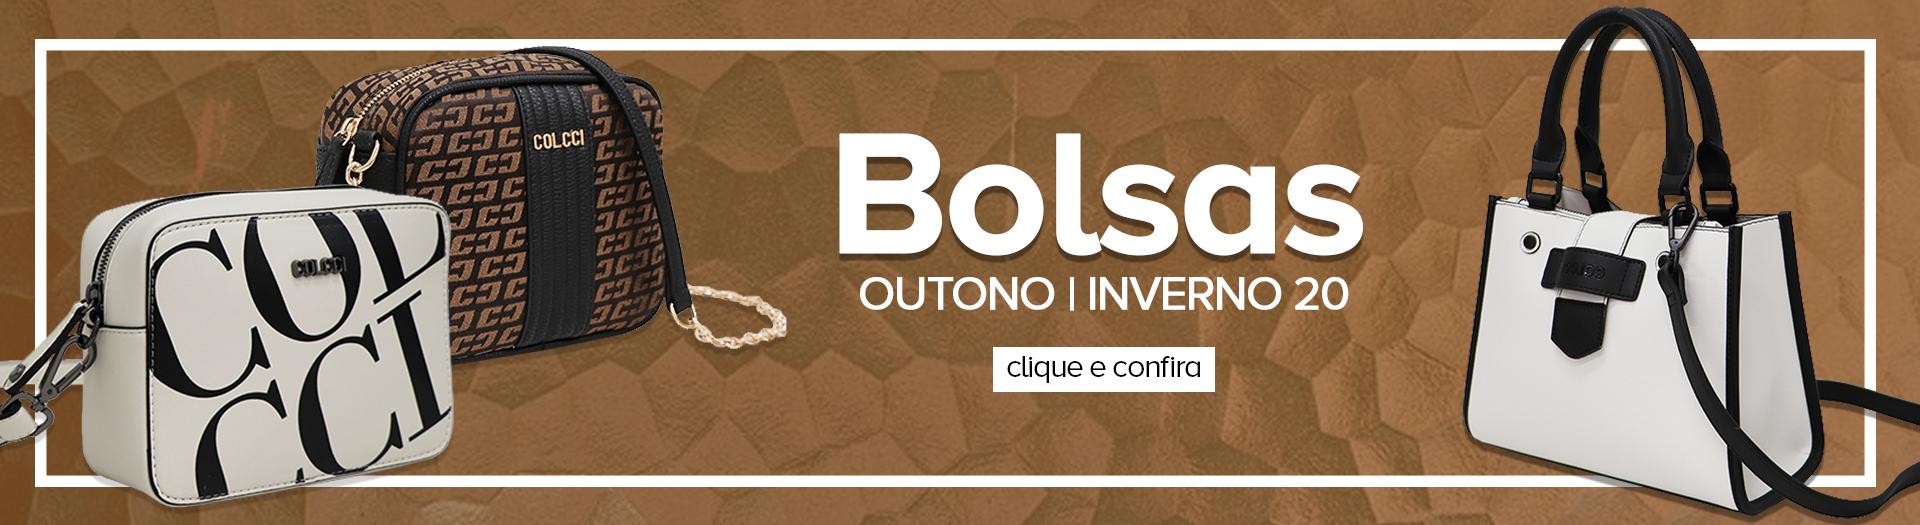 BOLSAS colcci